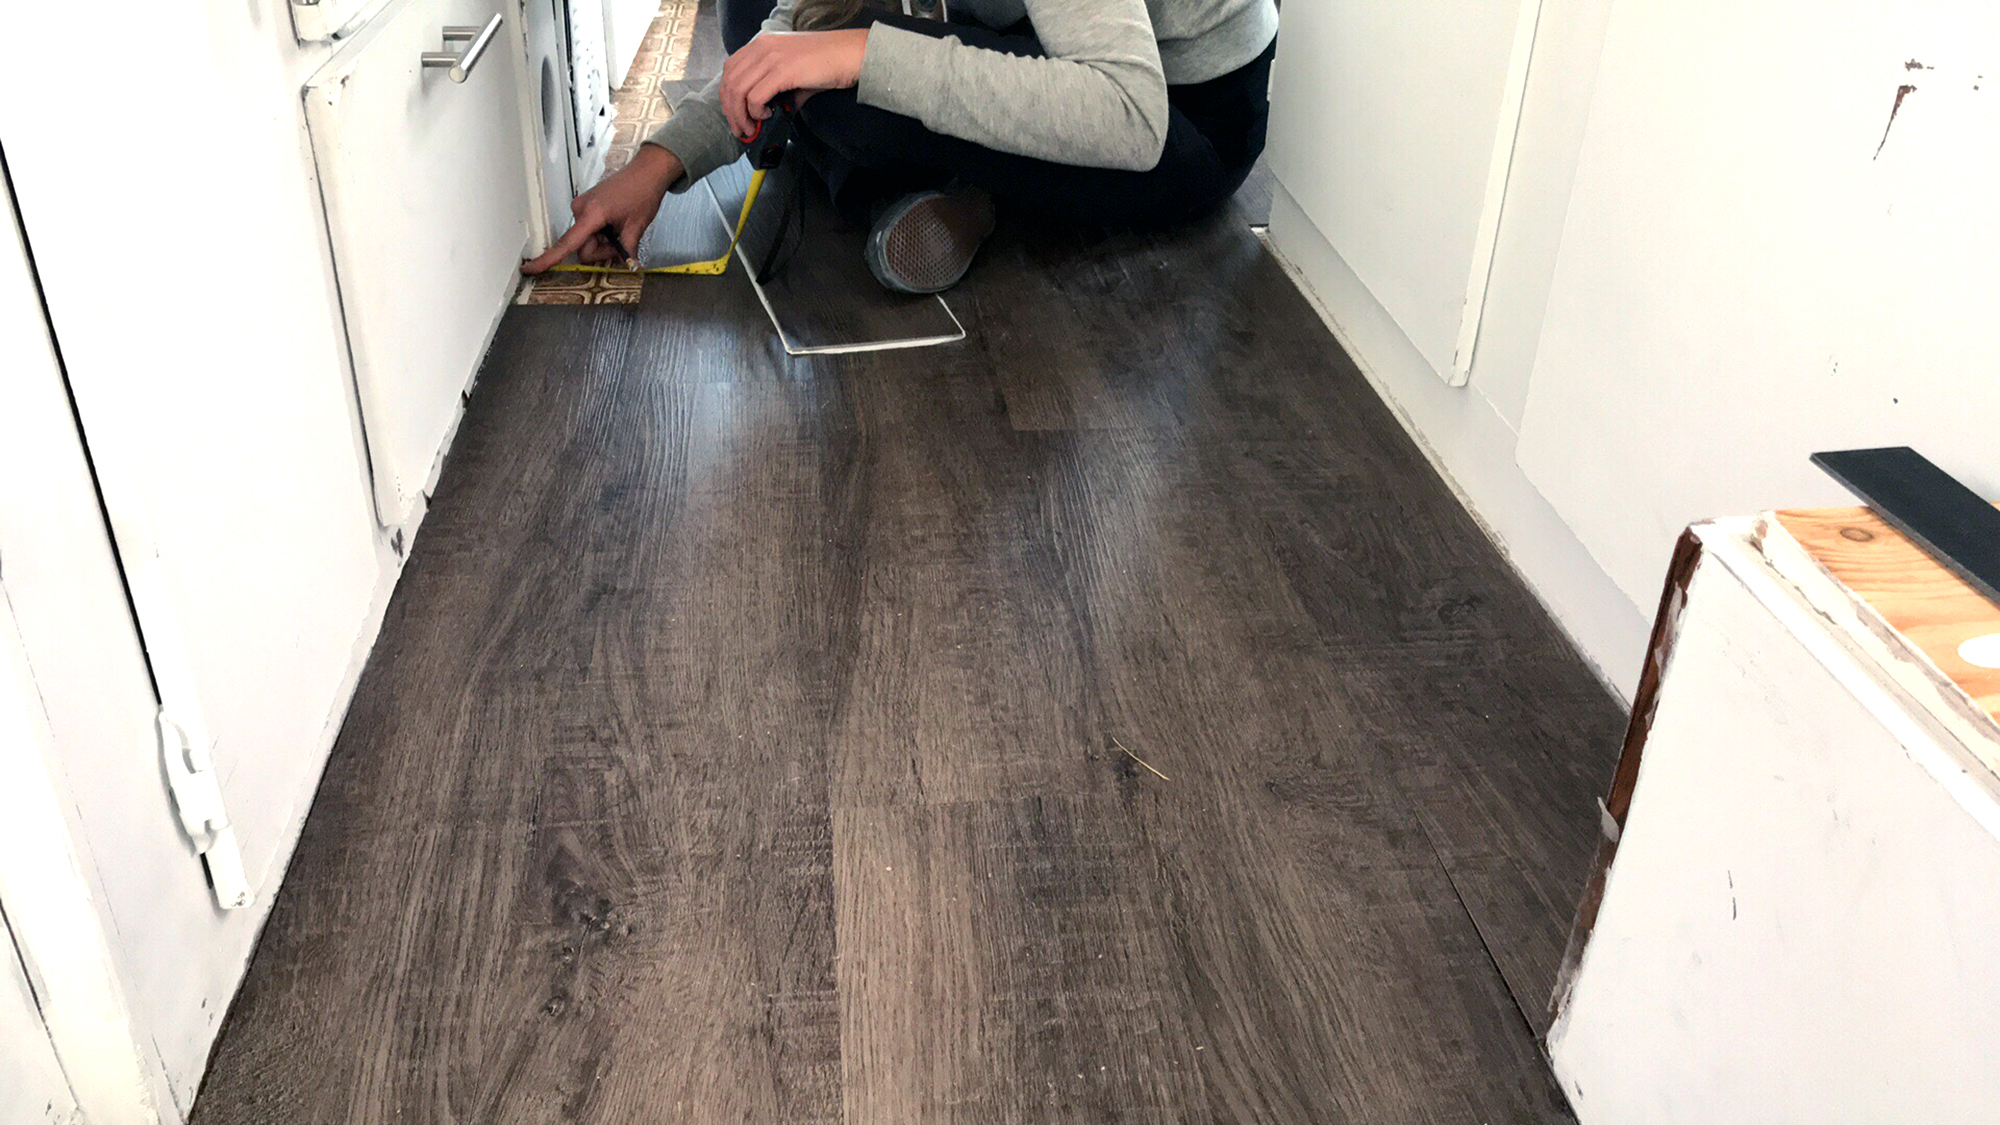 Generic Van Life - New Flooring